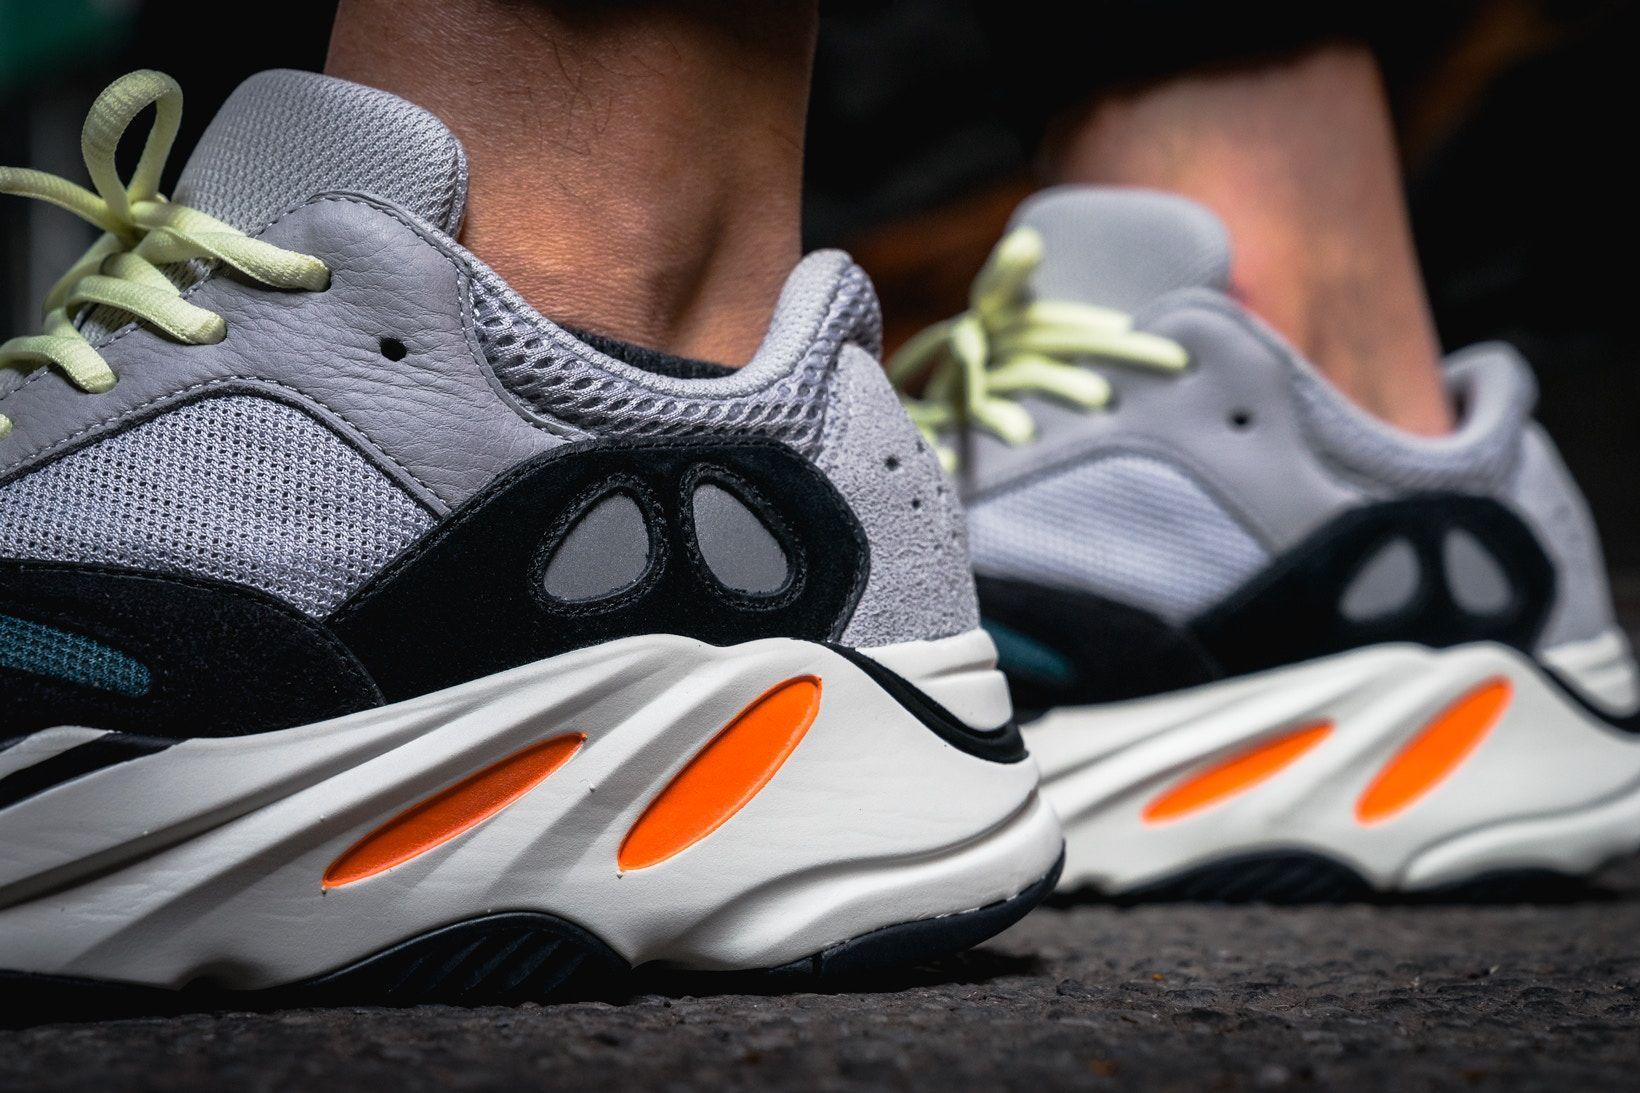 700 scarpe adidas yeezy ondata runner impulso pinterest yeezy